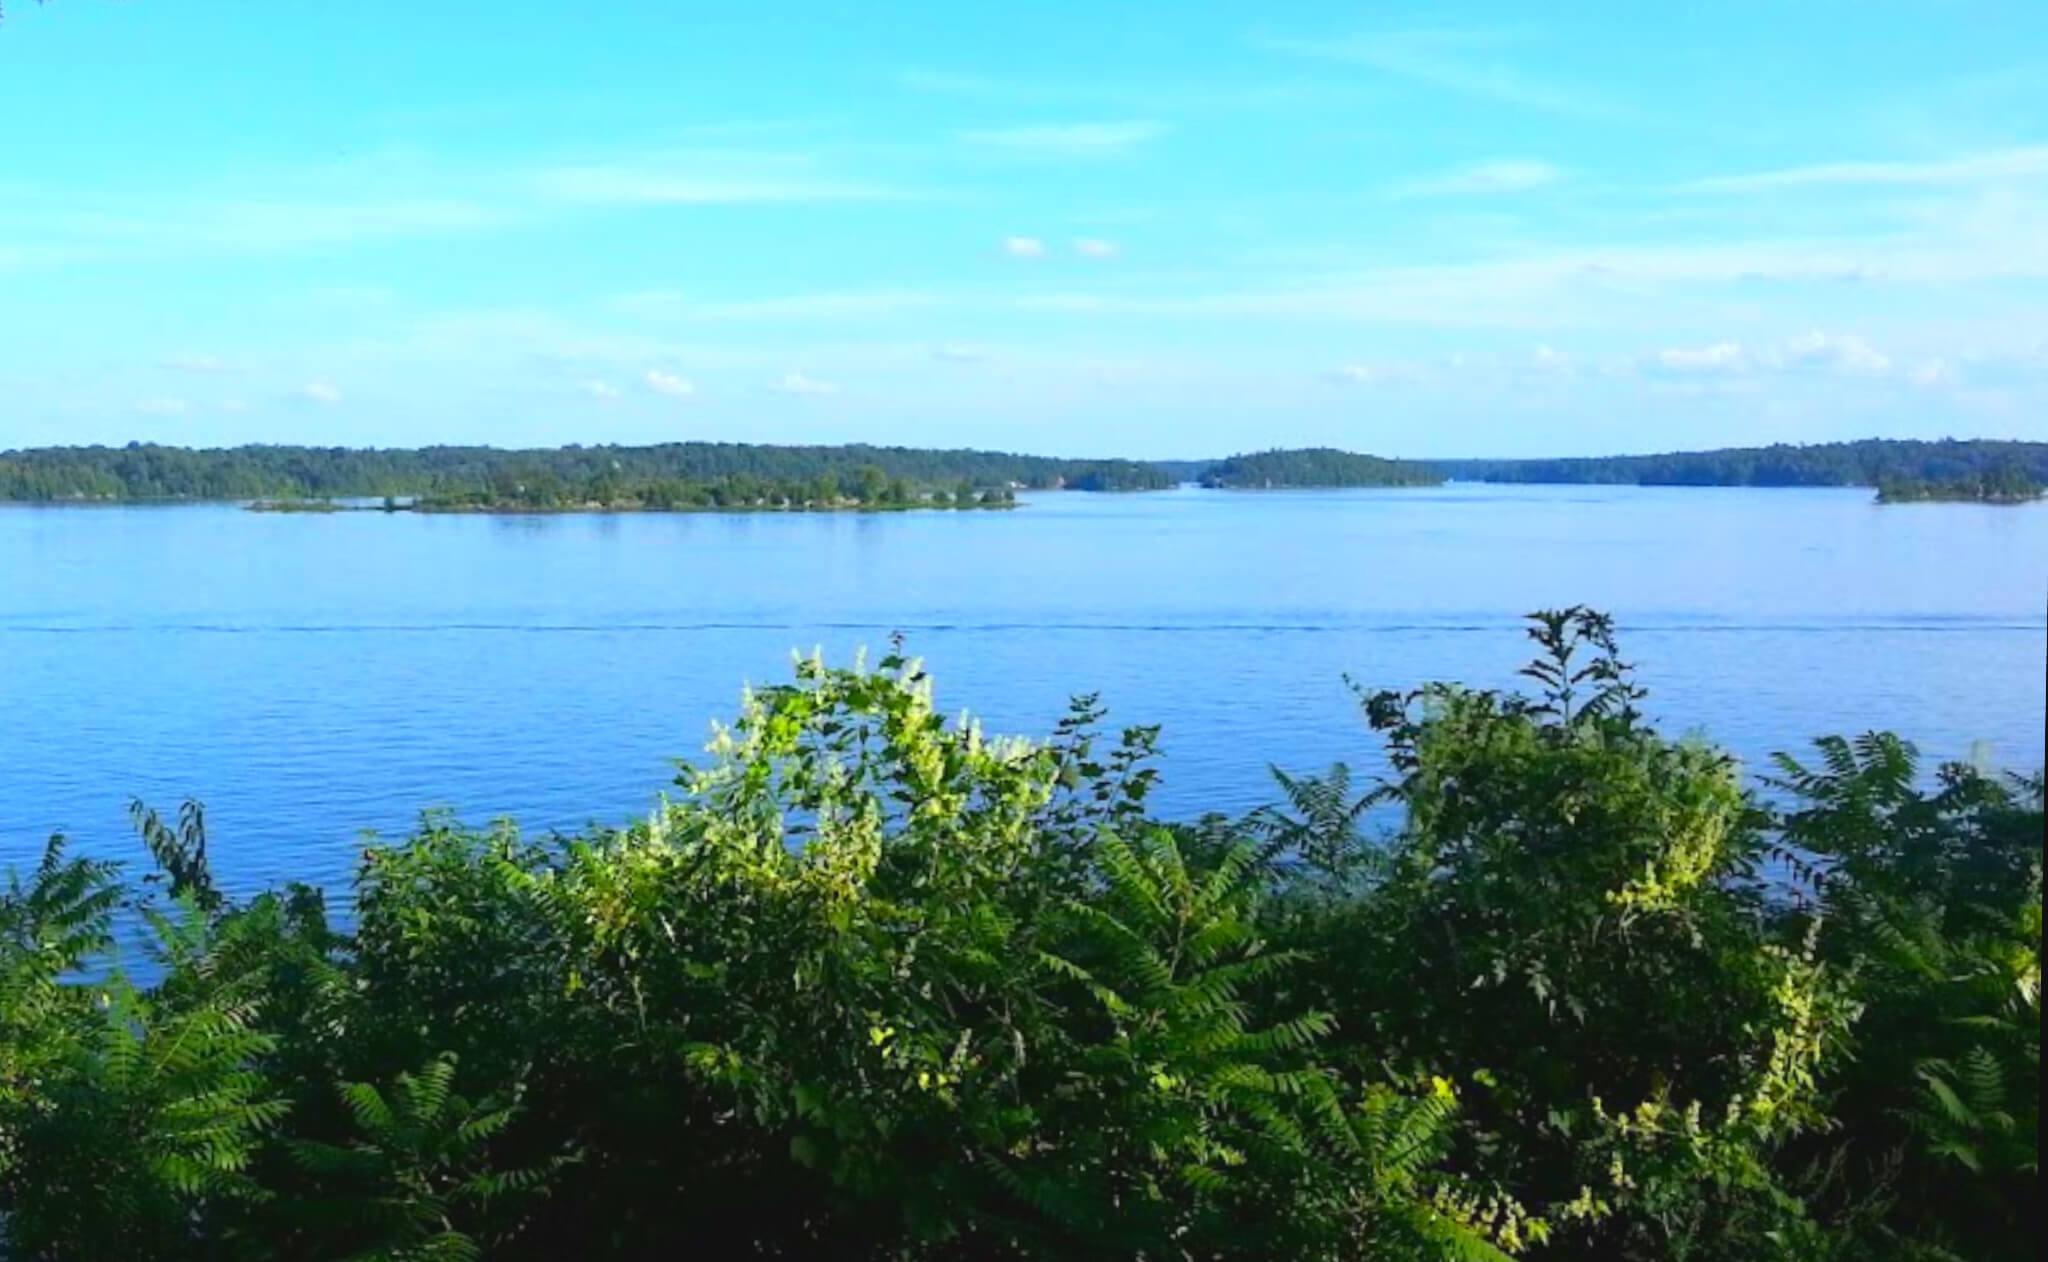 Black-Lake-Fishing-Report-Guide-New-York-NY-03